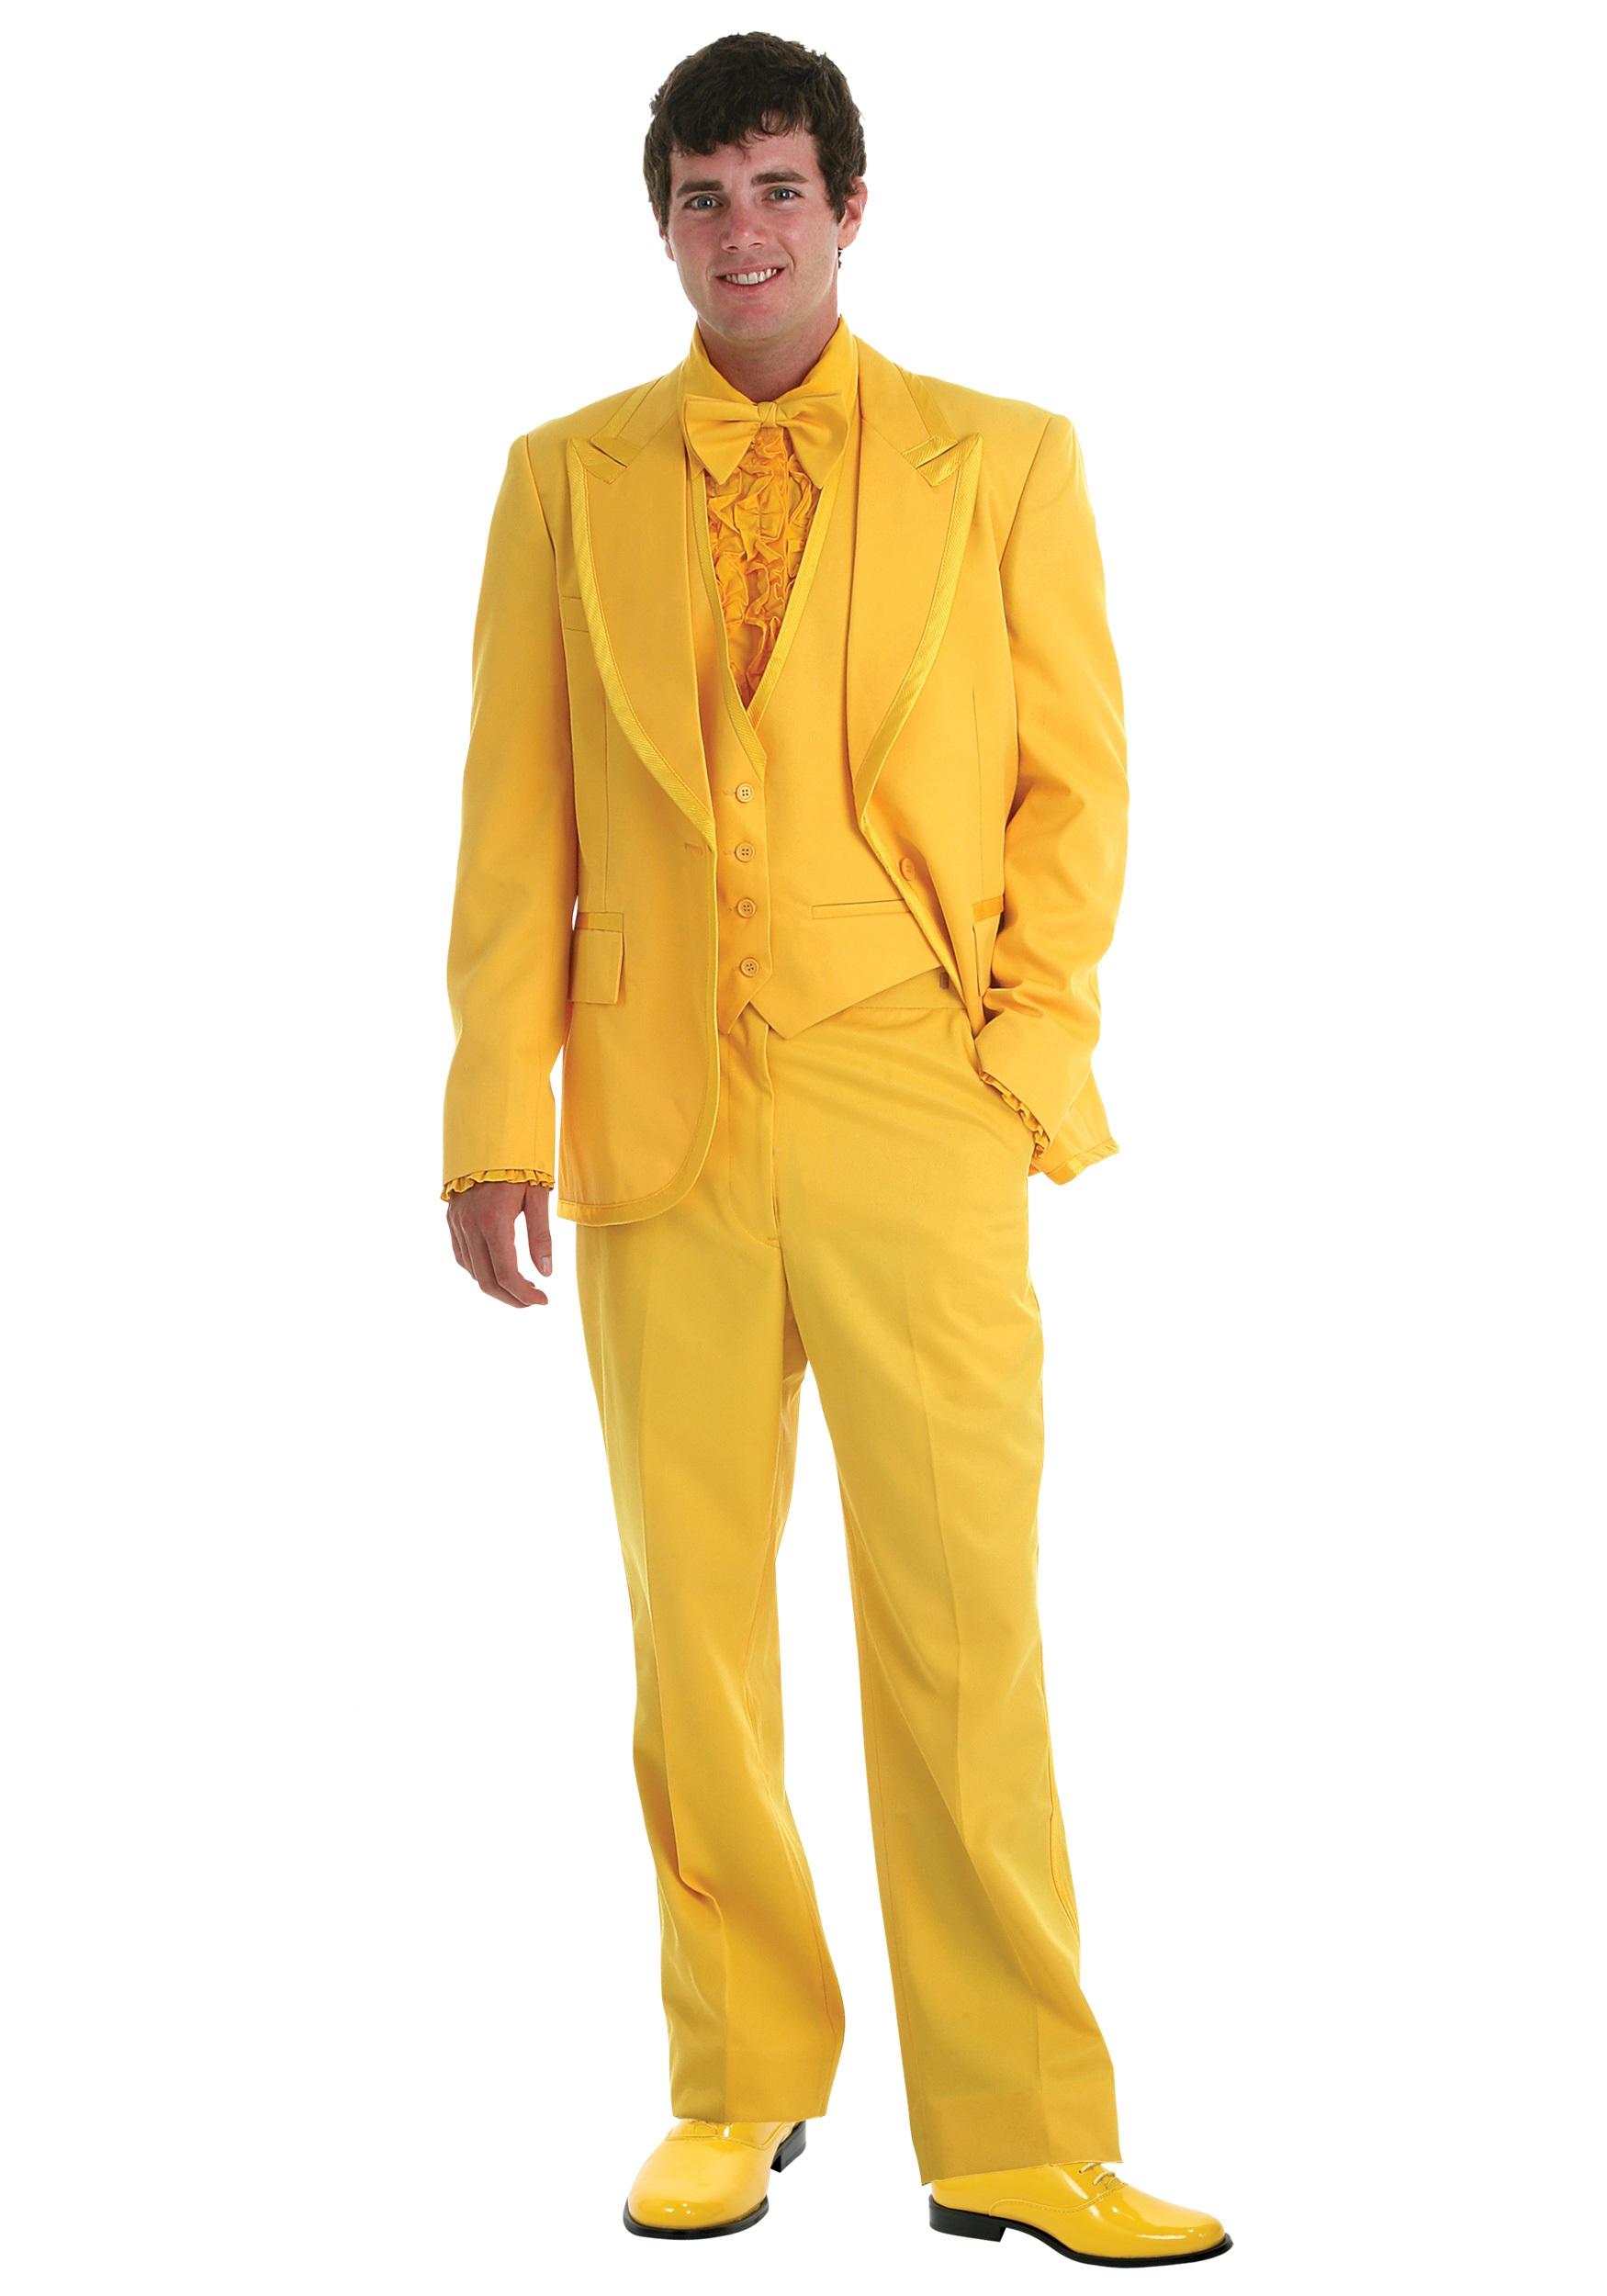 Men\'s Yellow Tuxedo - Prom Tuxedo Rentals